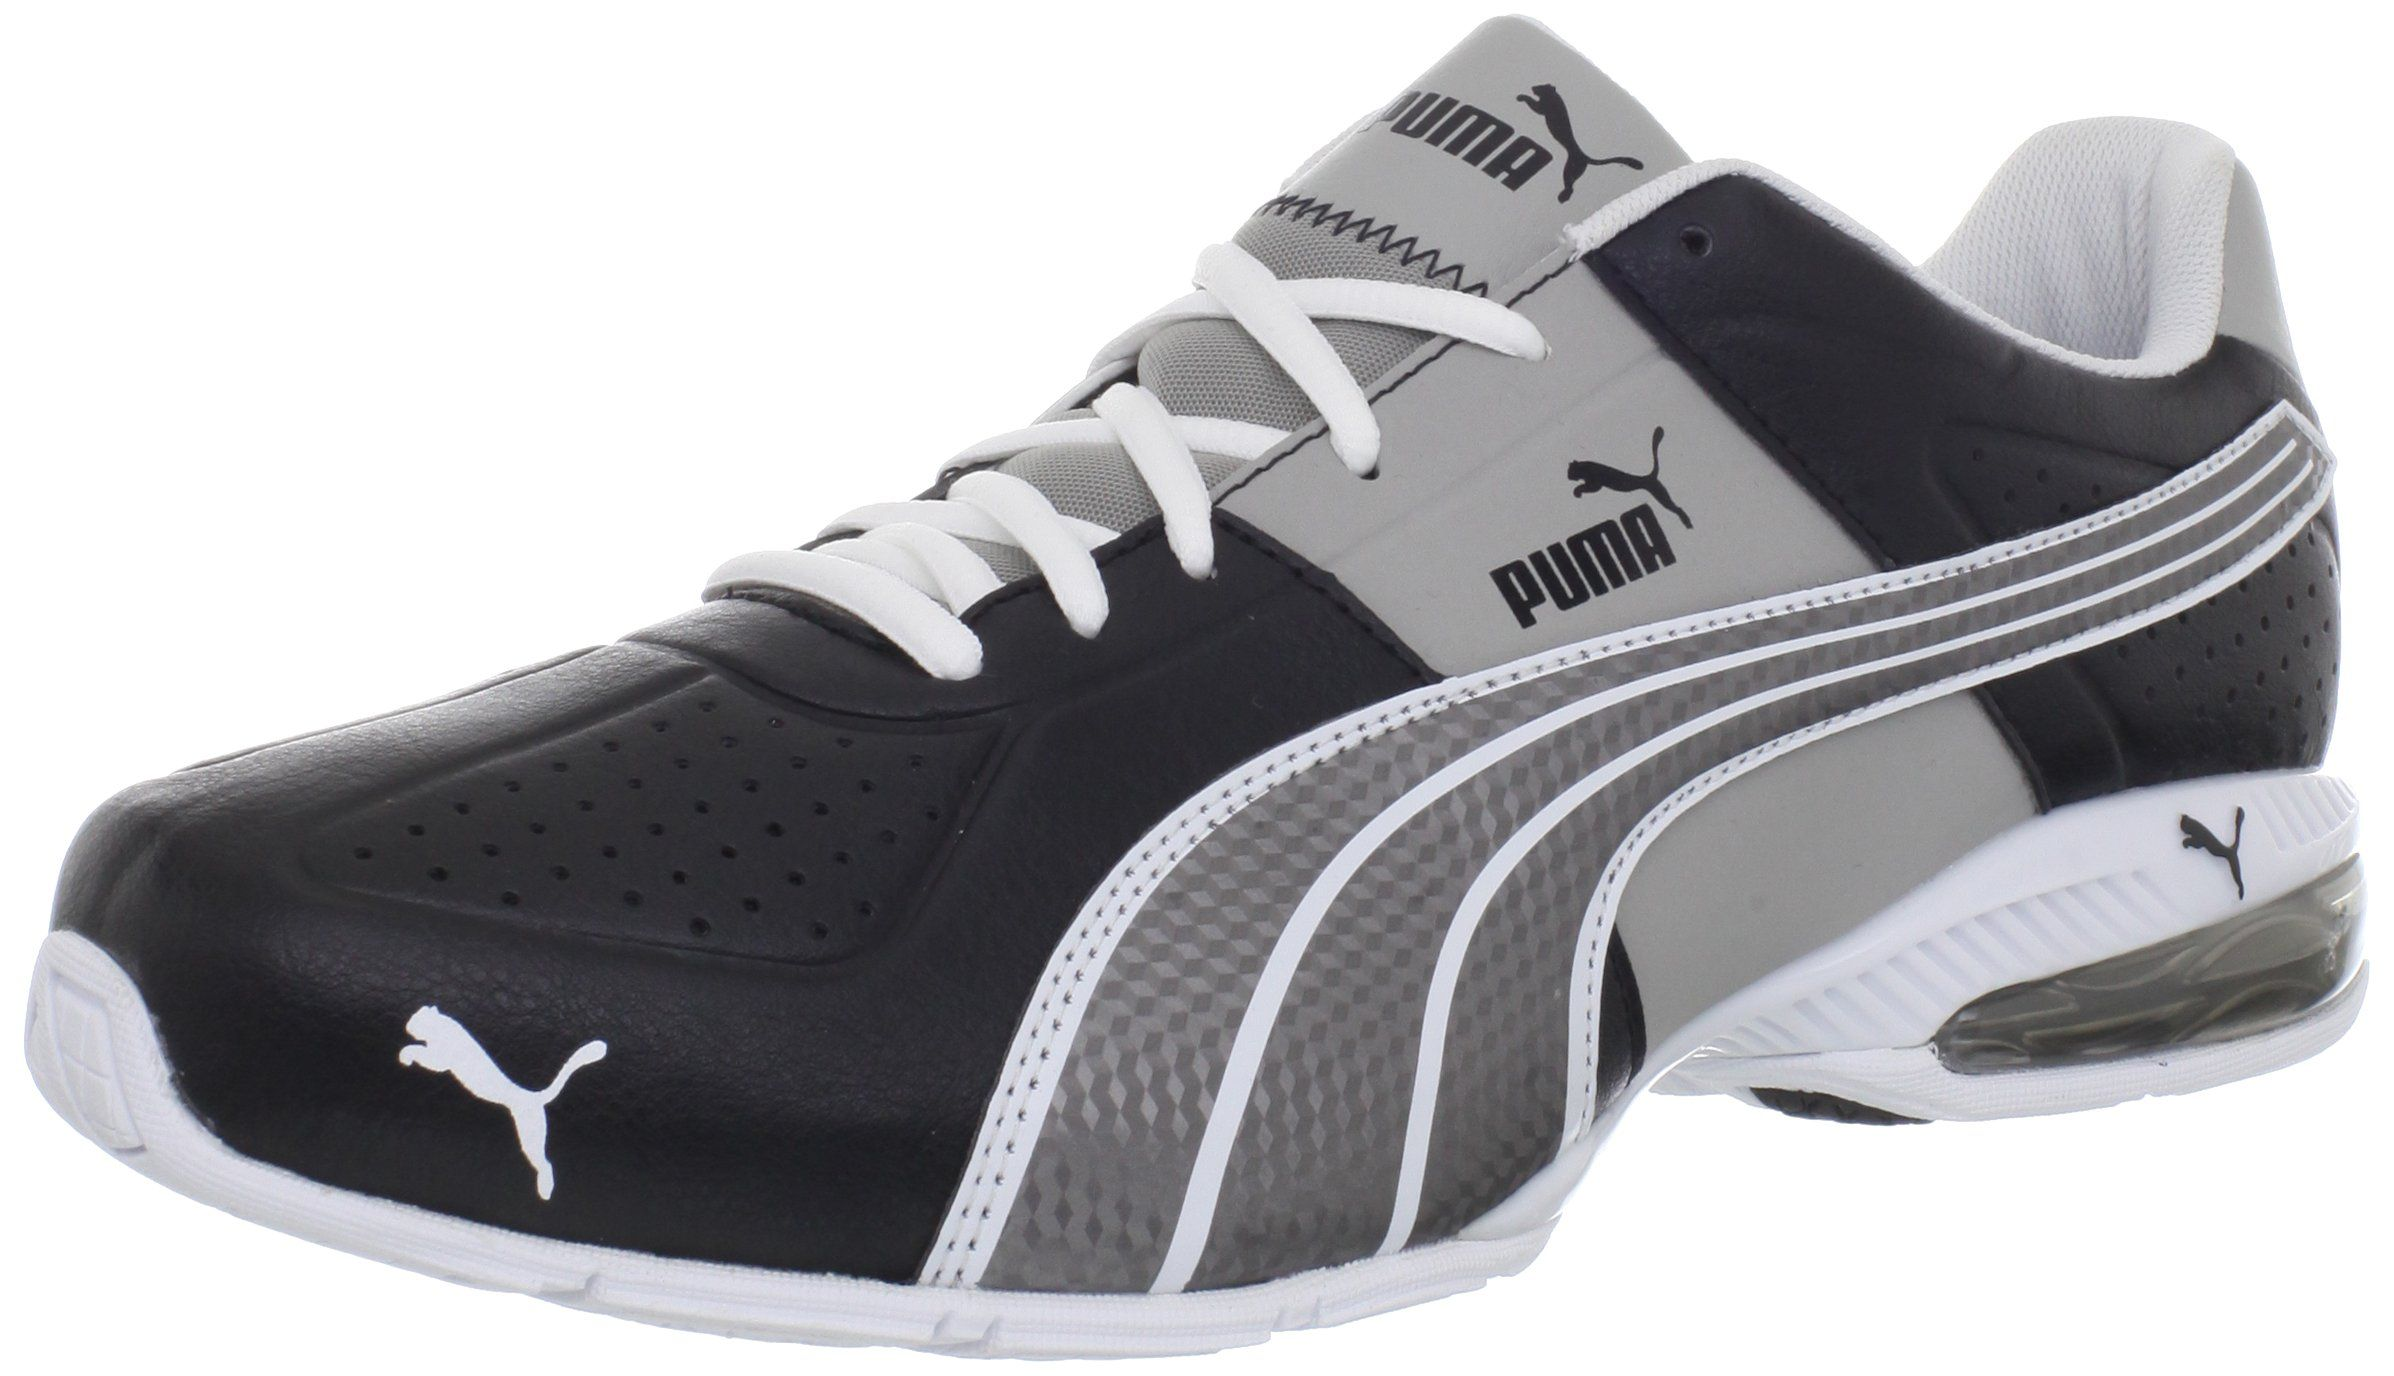 Running shoes for men, Puma mens